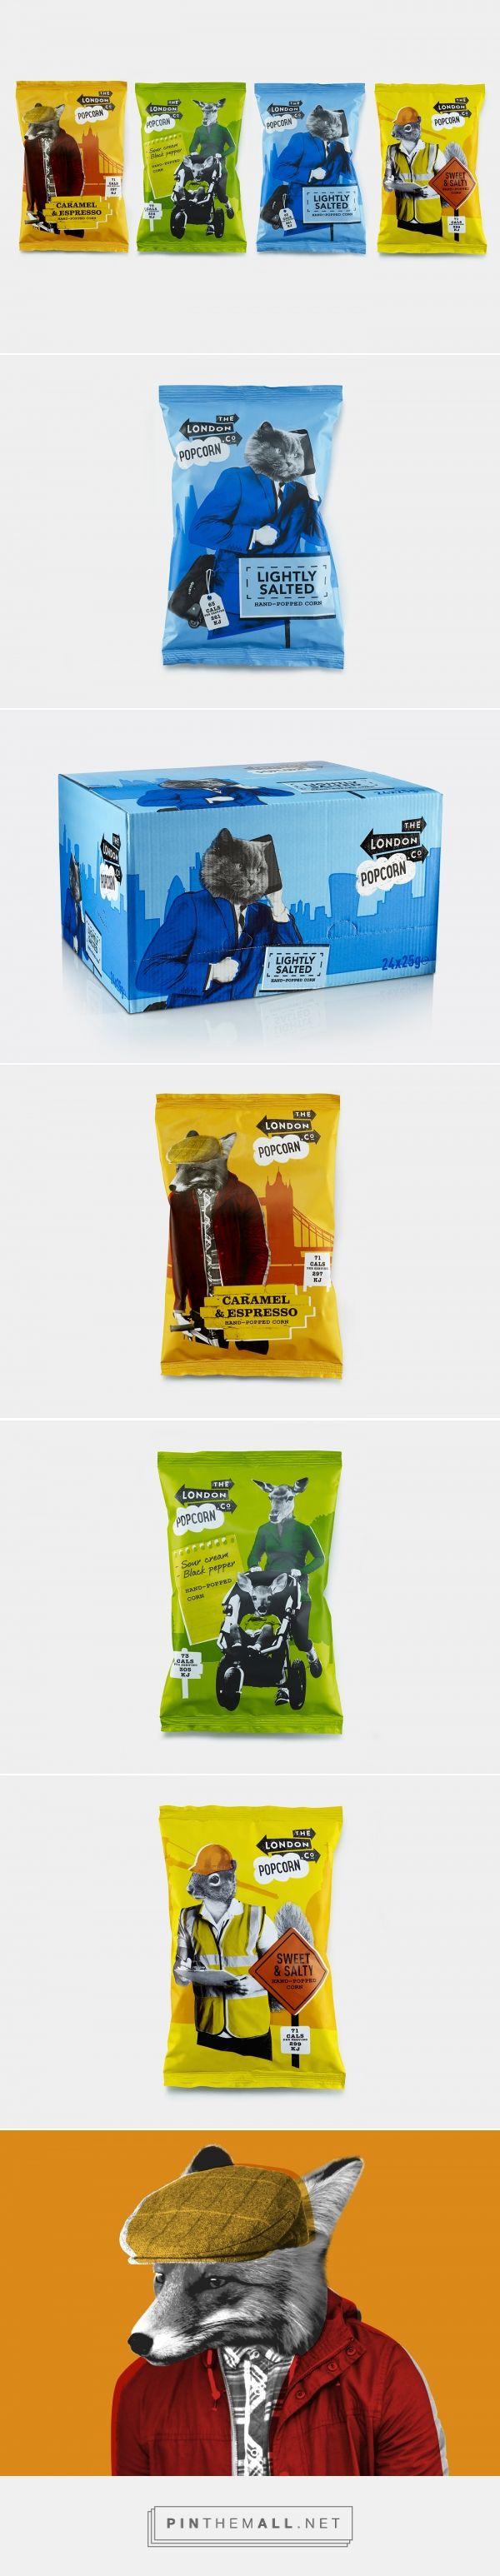 London Popcorn Co. - Packaging of the World - Creative Package Design Gallery - http://www.packagingoftheworld.com/2017/01/london-popcorn-co.html